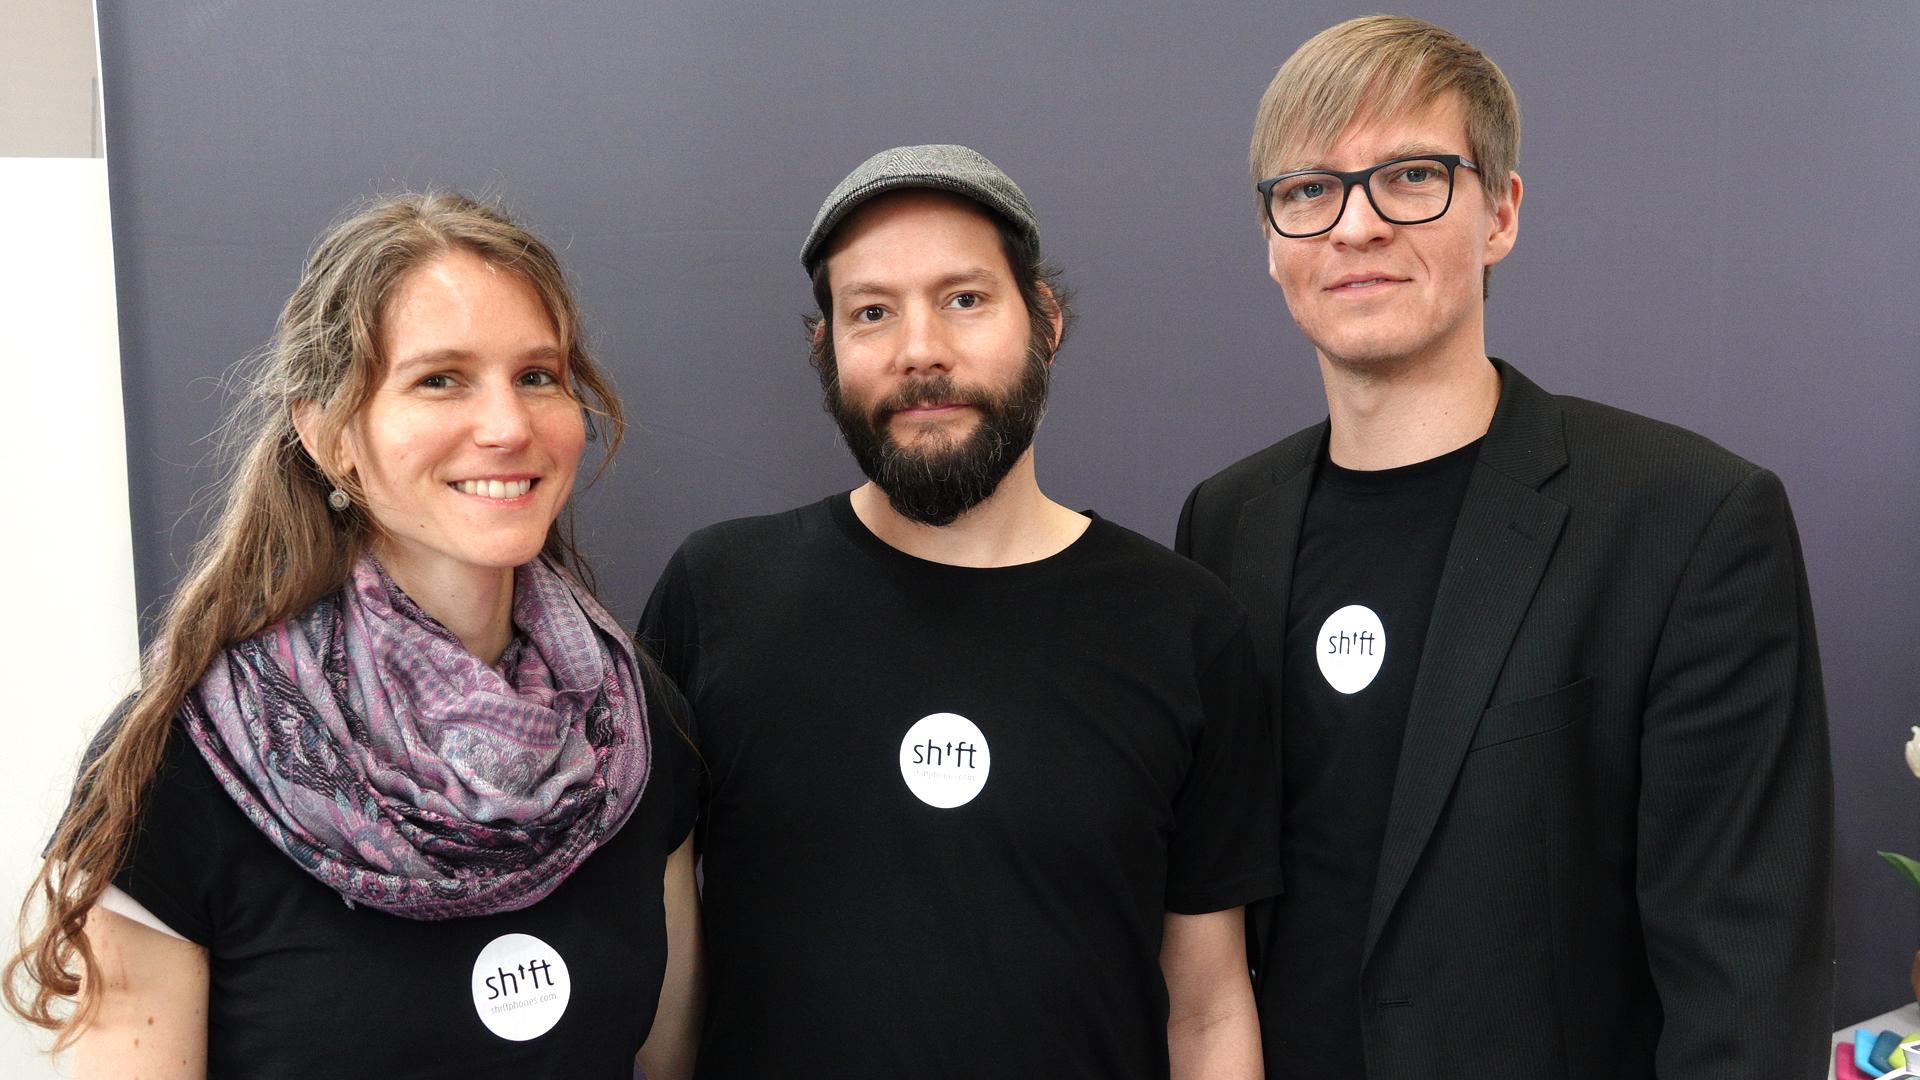 Die Köpfe hinter Shift: (v.l.) Deborah Waldeck, Carsten Waldeck, Produktdesigner Daniel Rauh